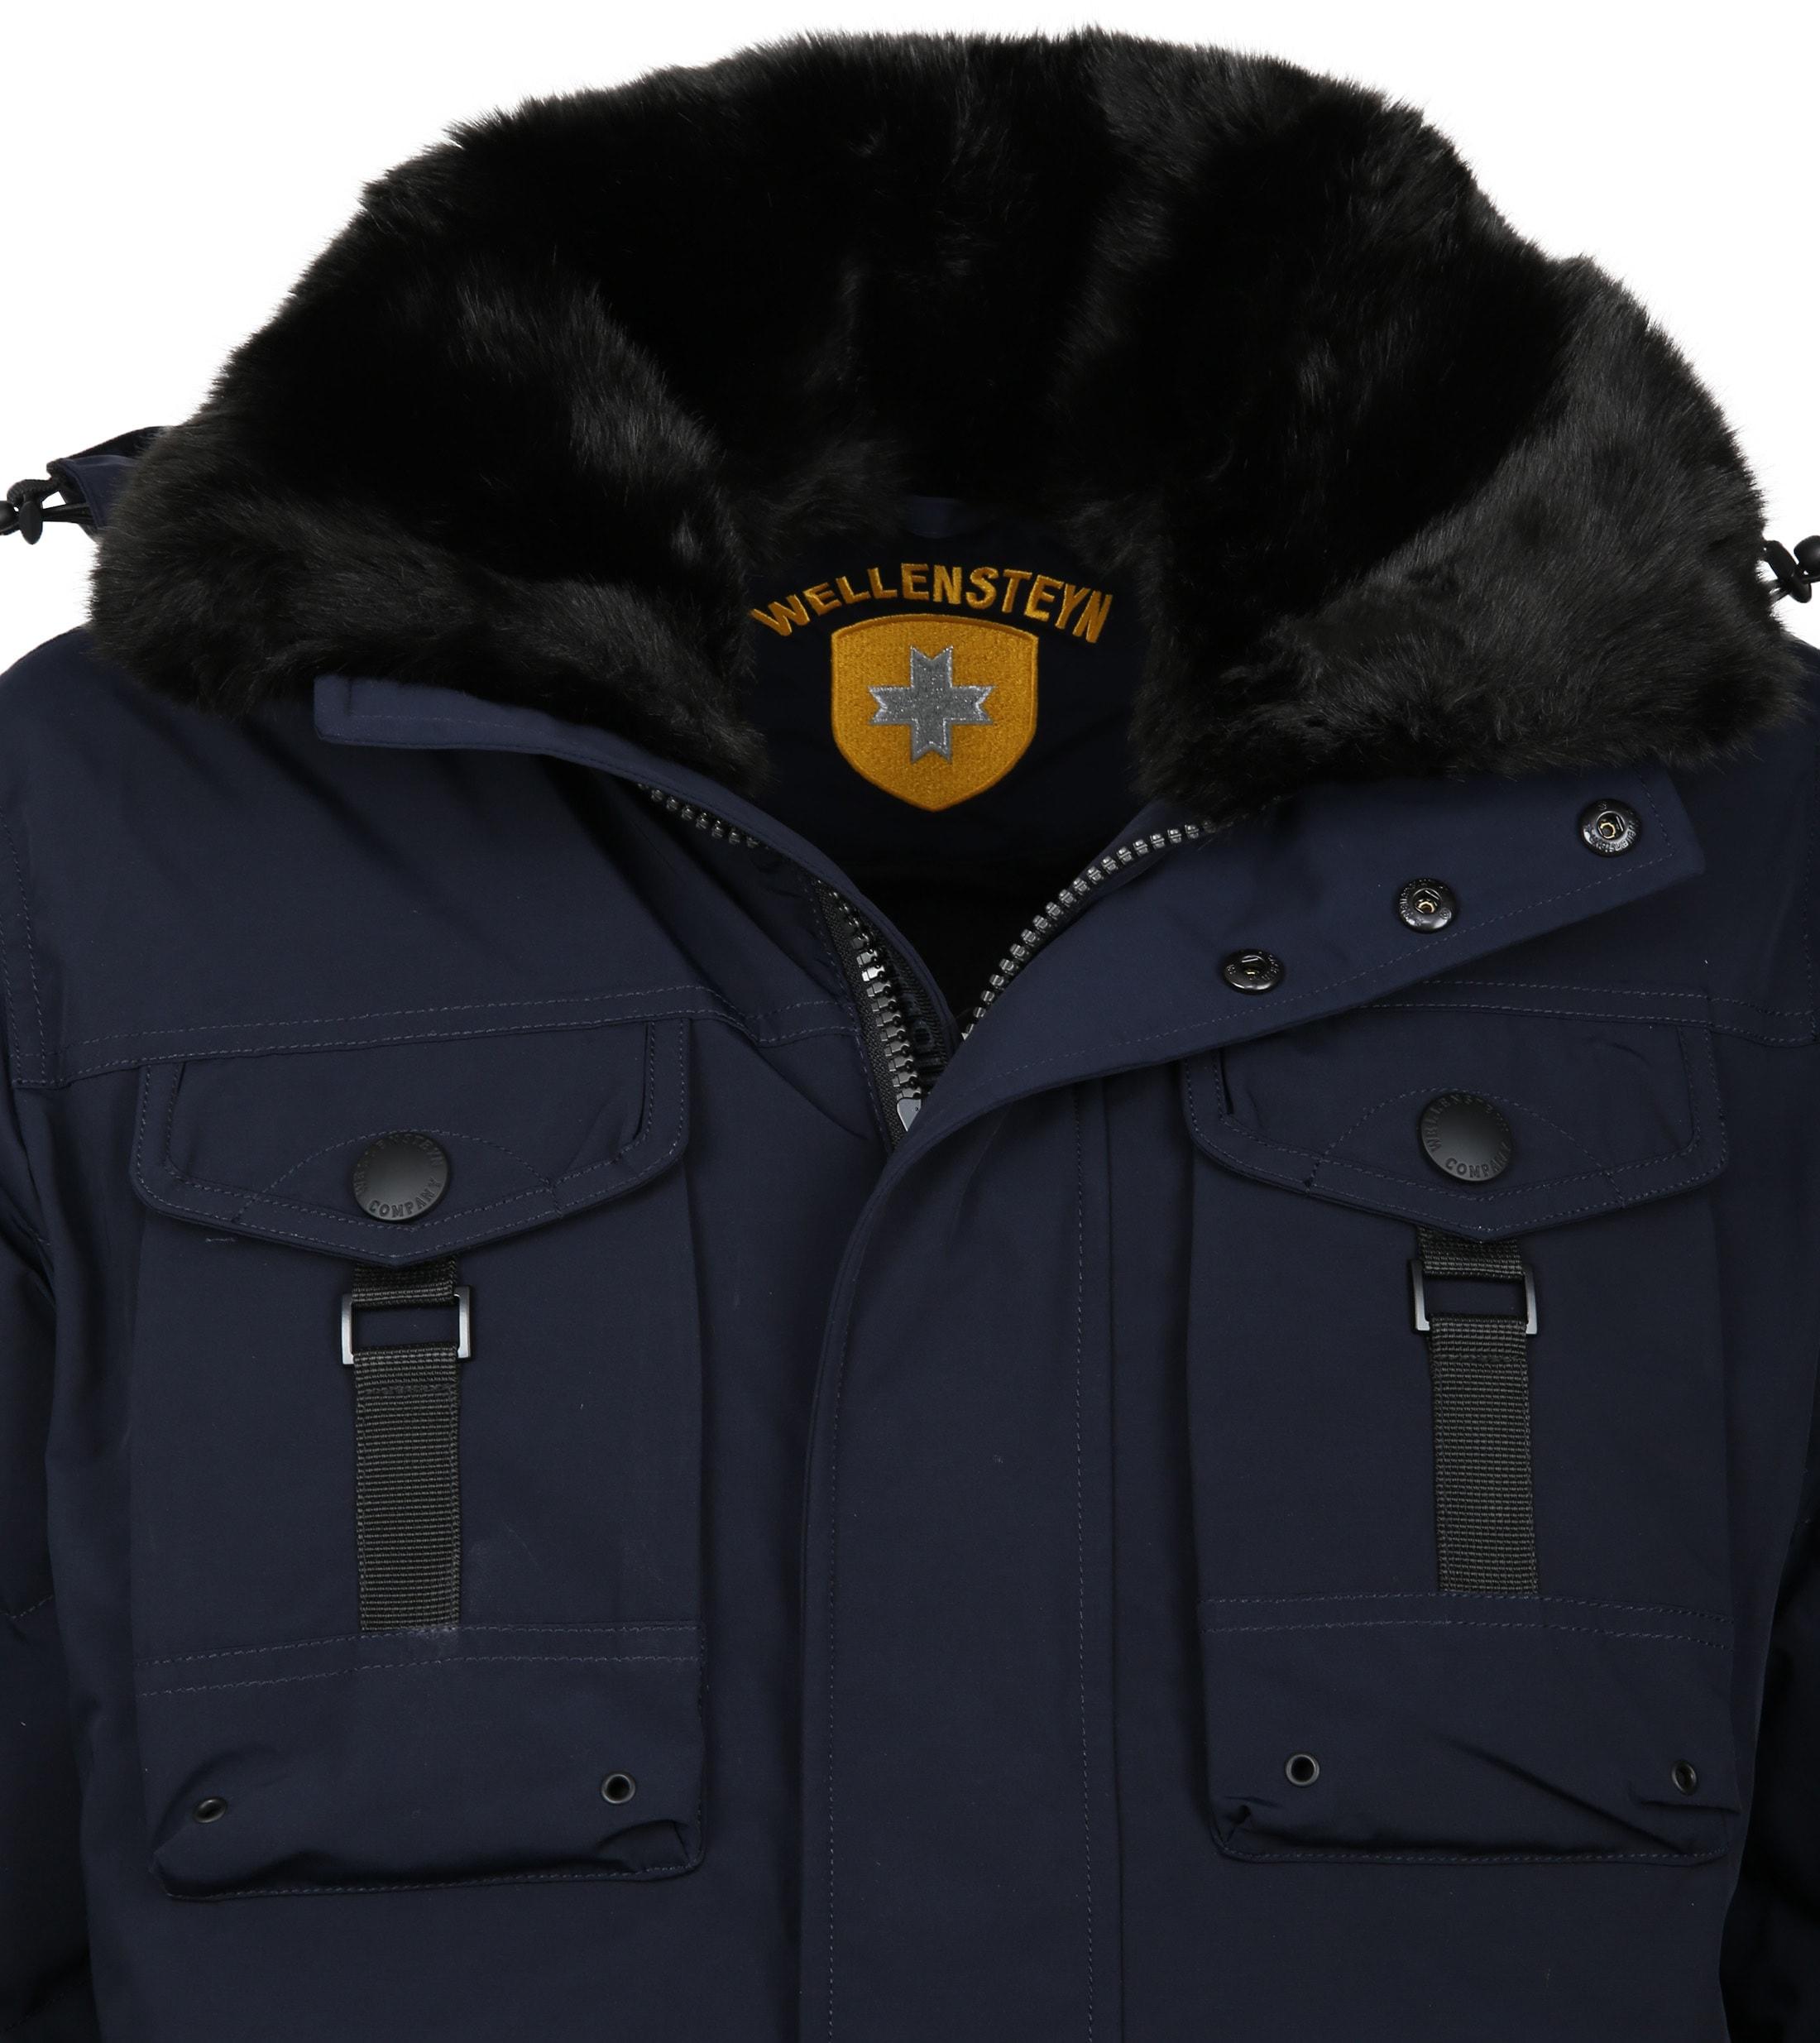 Wellensteyn Firewall Jacket Dark Blue foto 1